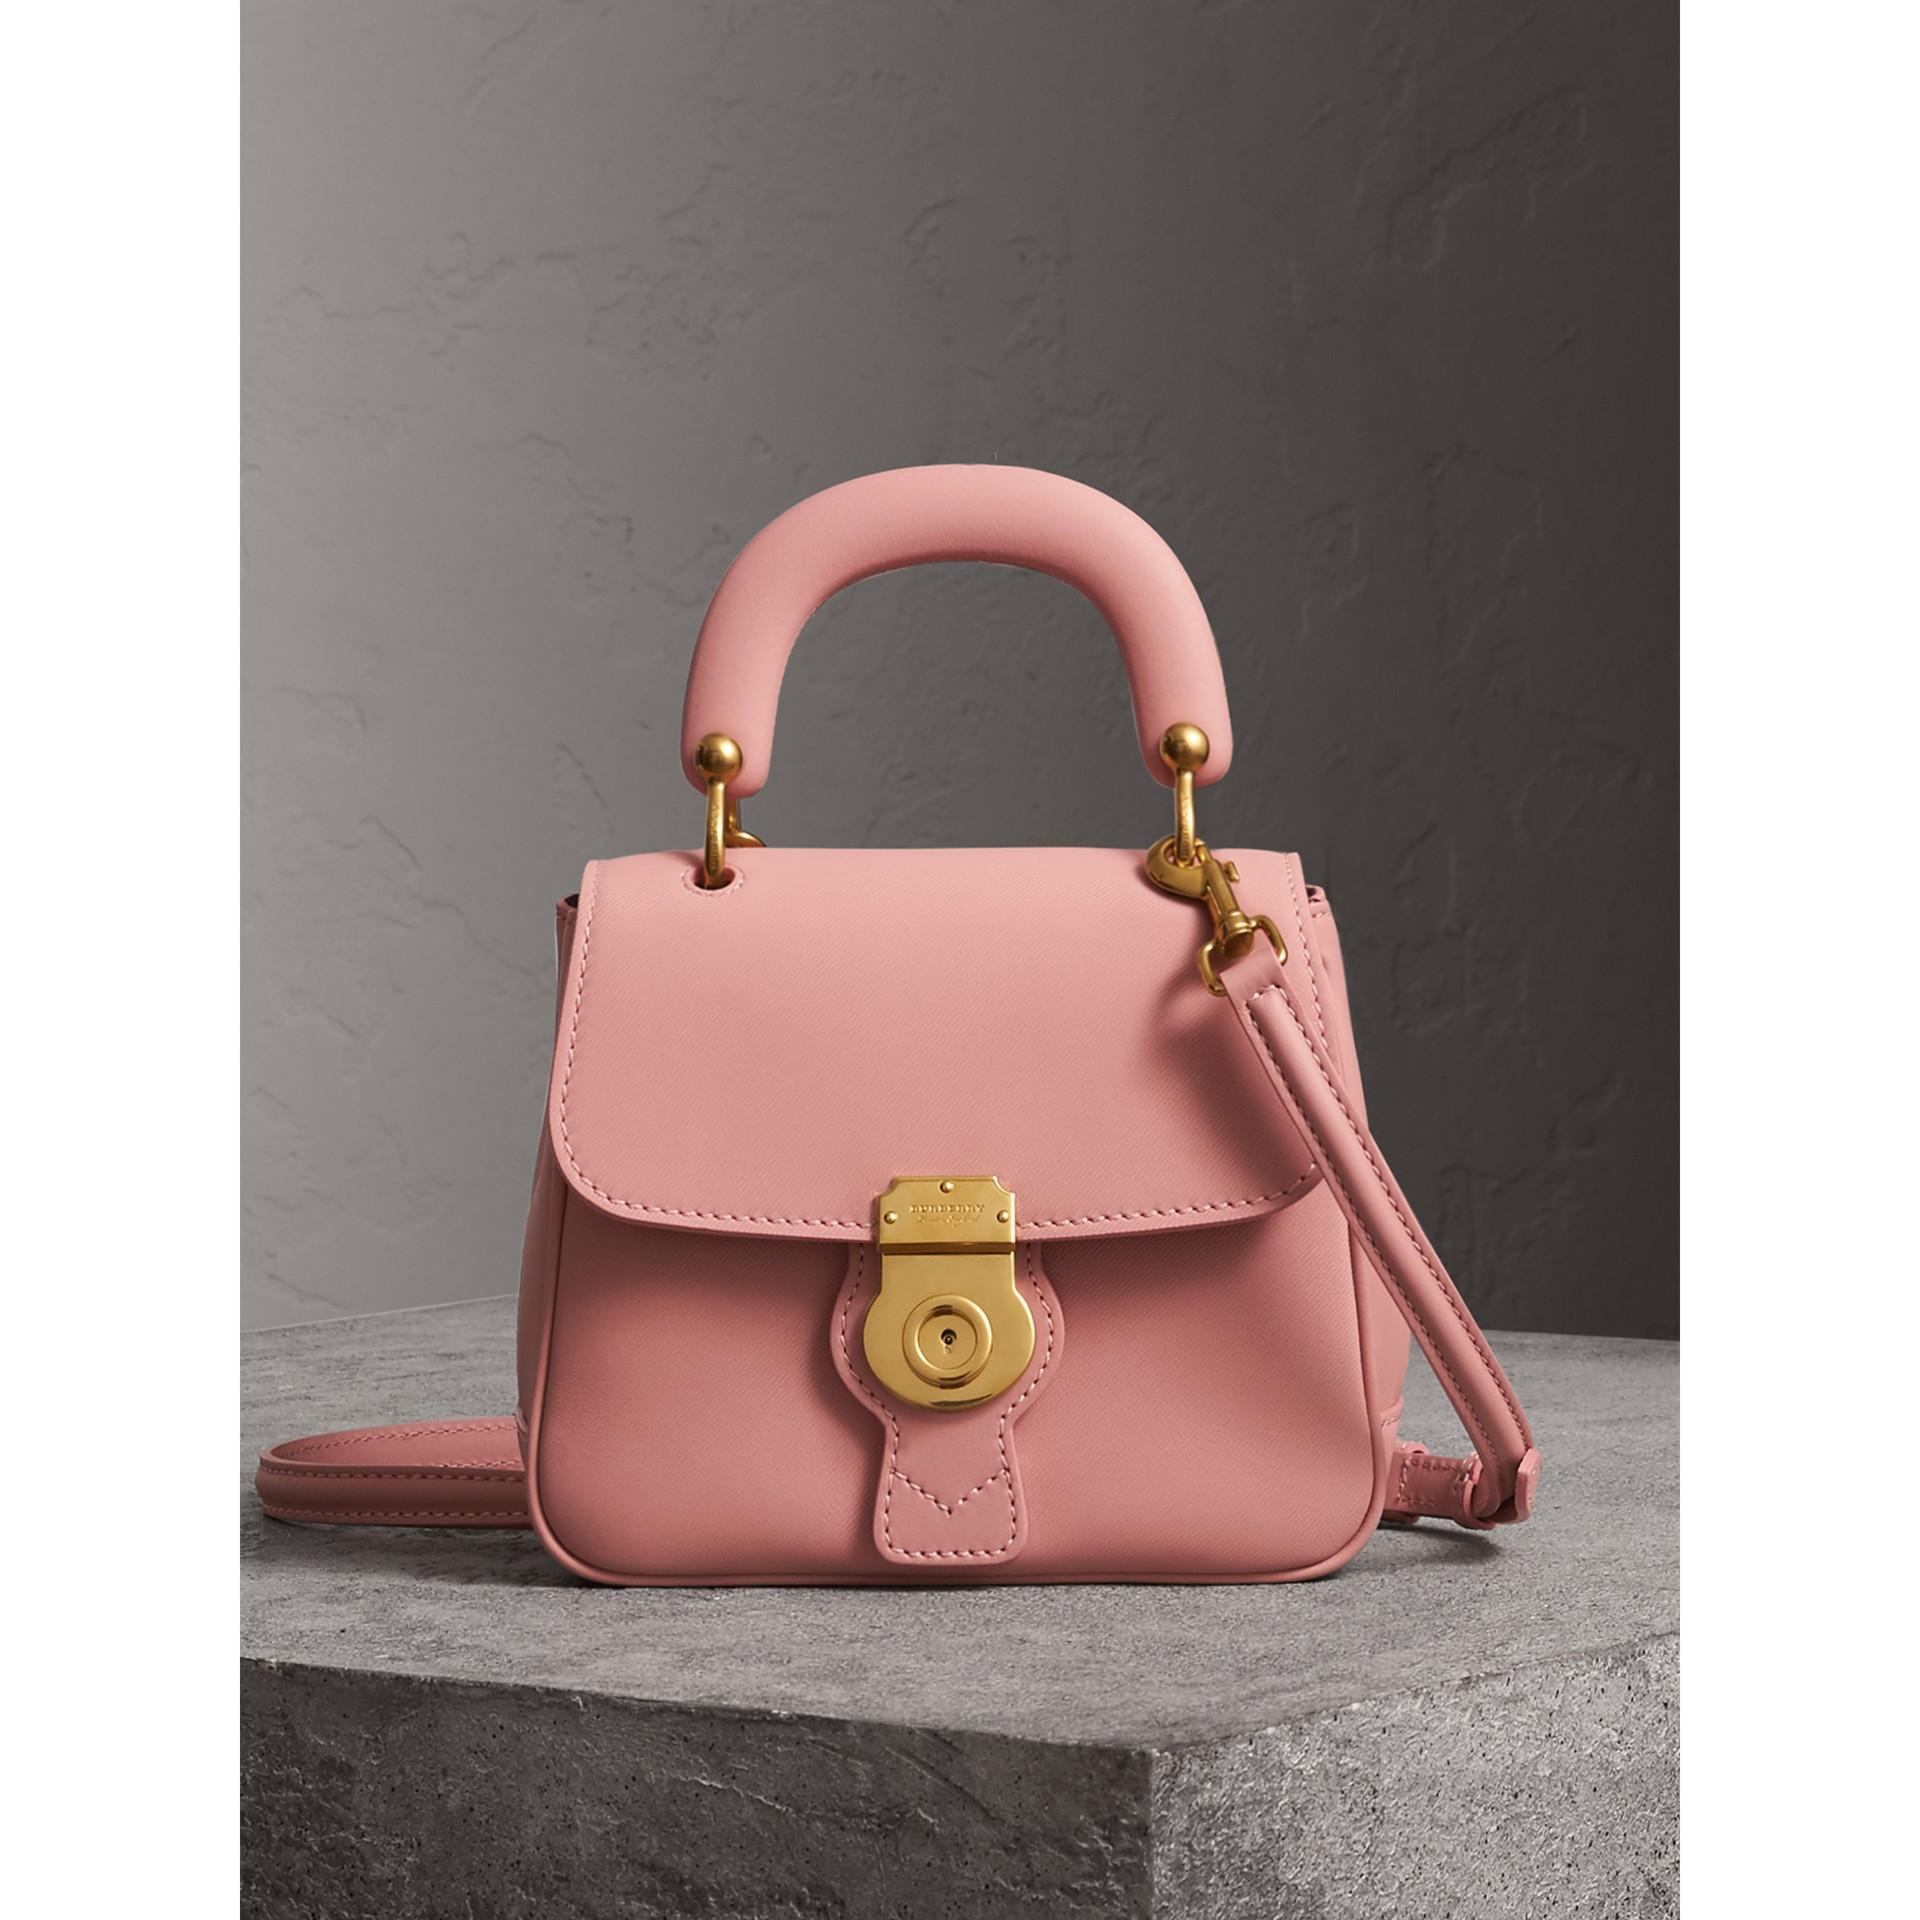 Burberry The Small Dk88 Top Handle Bag In Ash Rose   ModeSens 5c3d80ba85